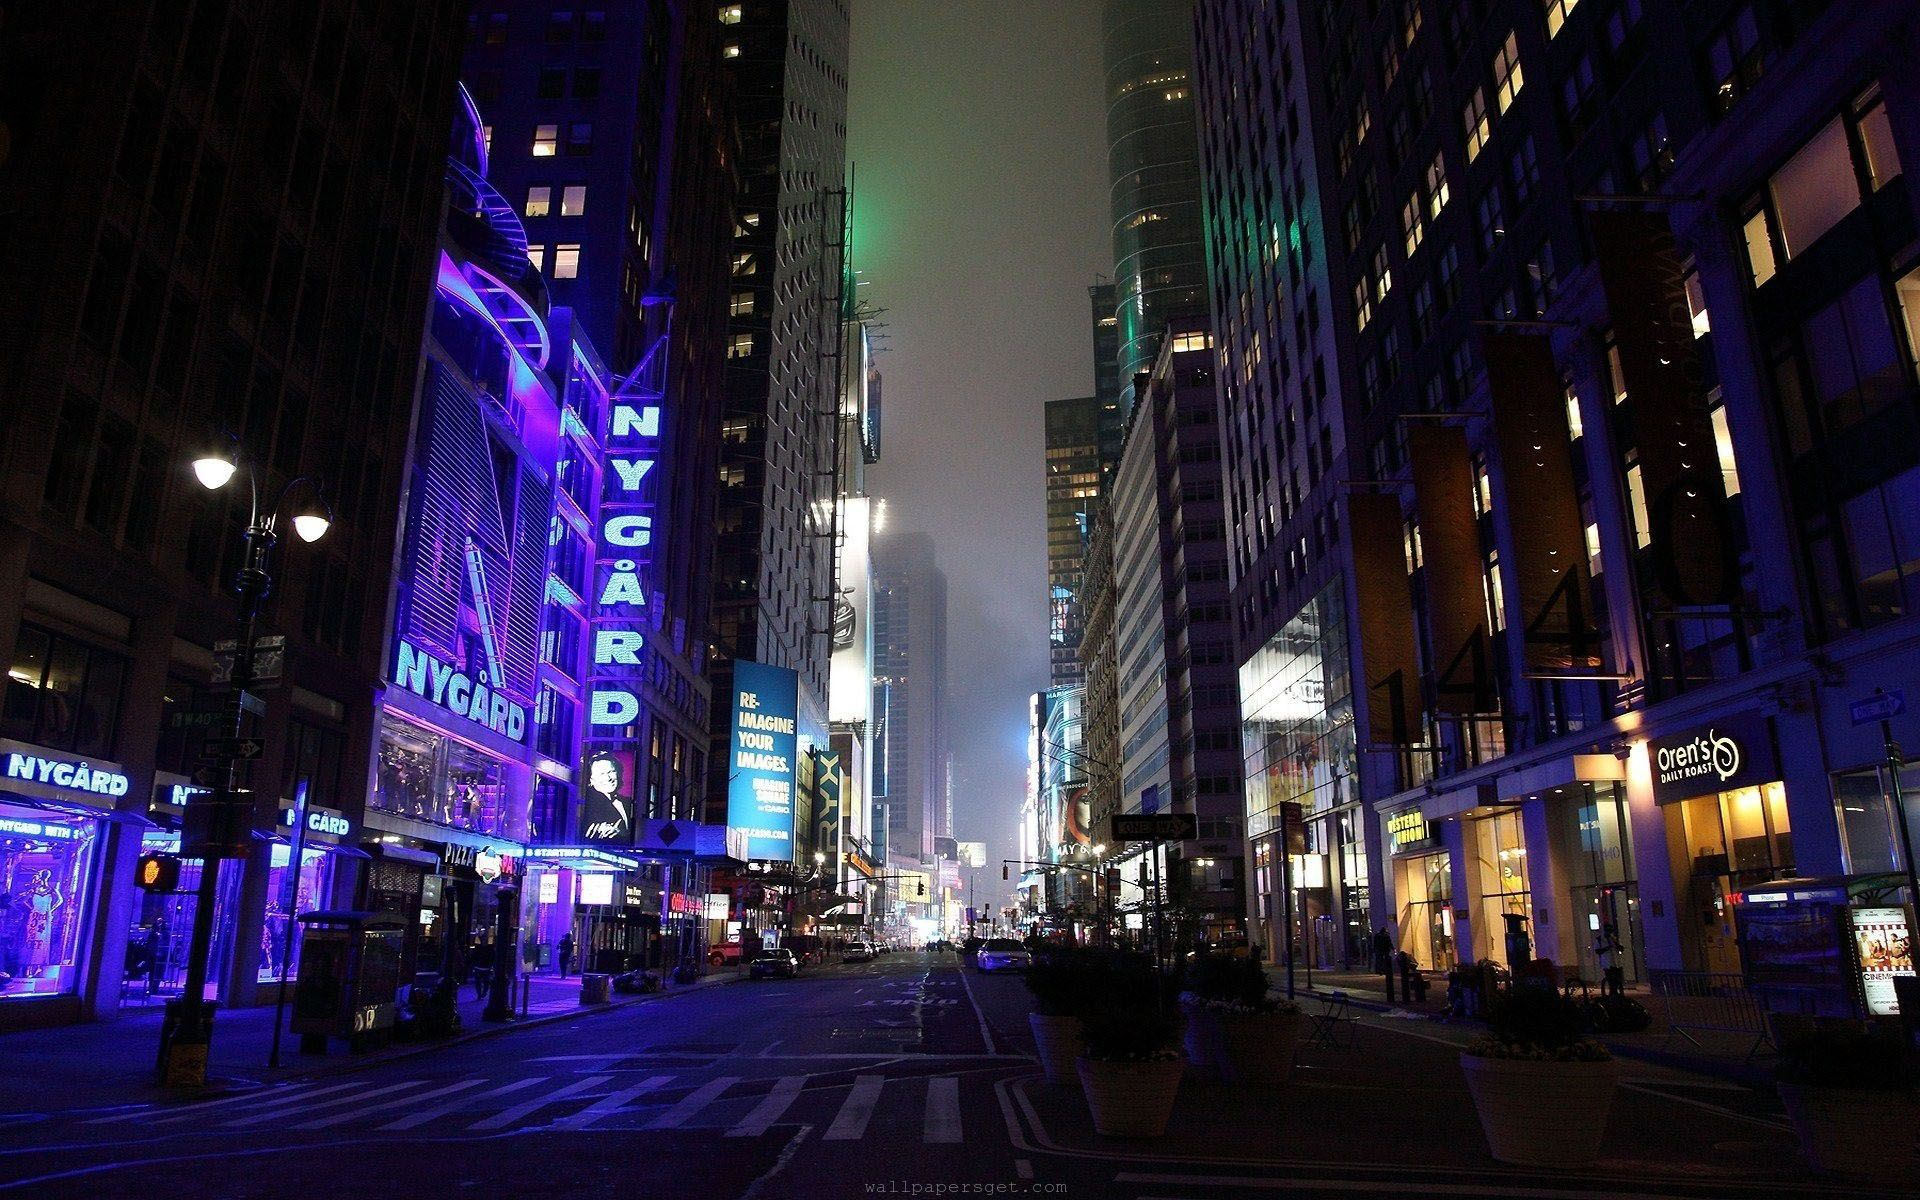 New York City Street At Night High Quality Wallpaper Hd Resolution City Lights At Night Night City City Wallpaper